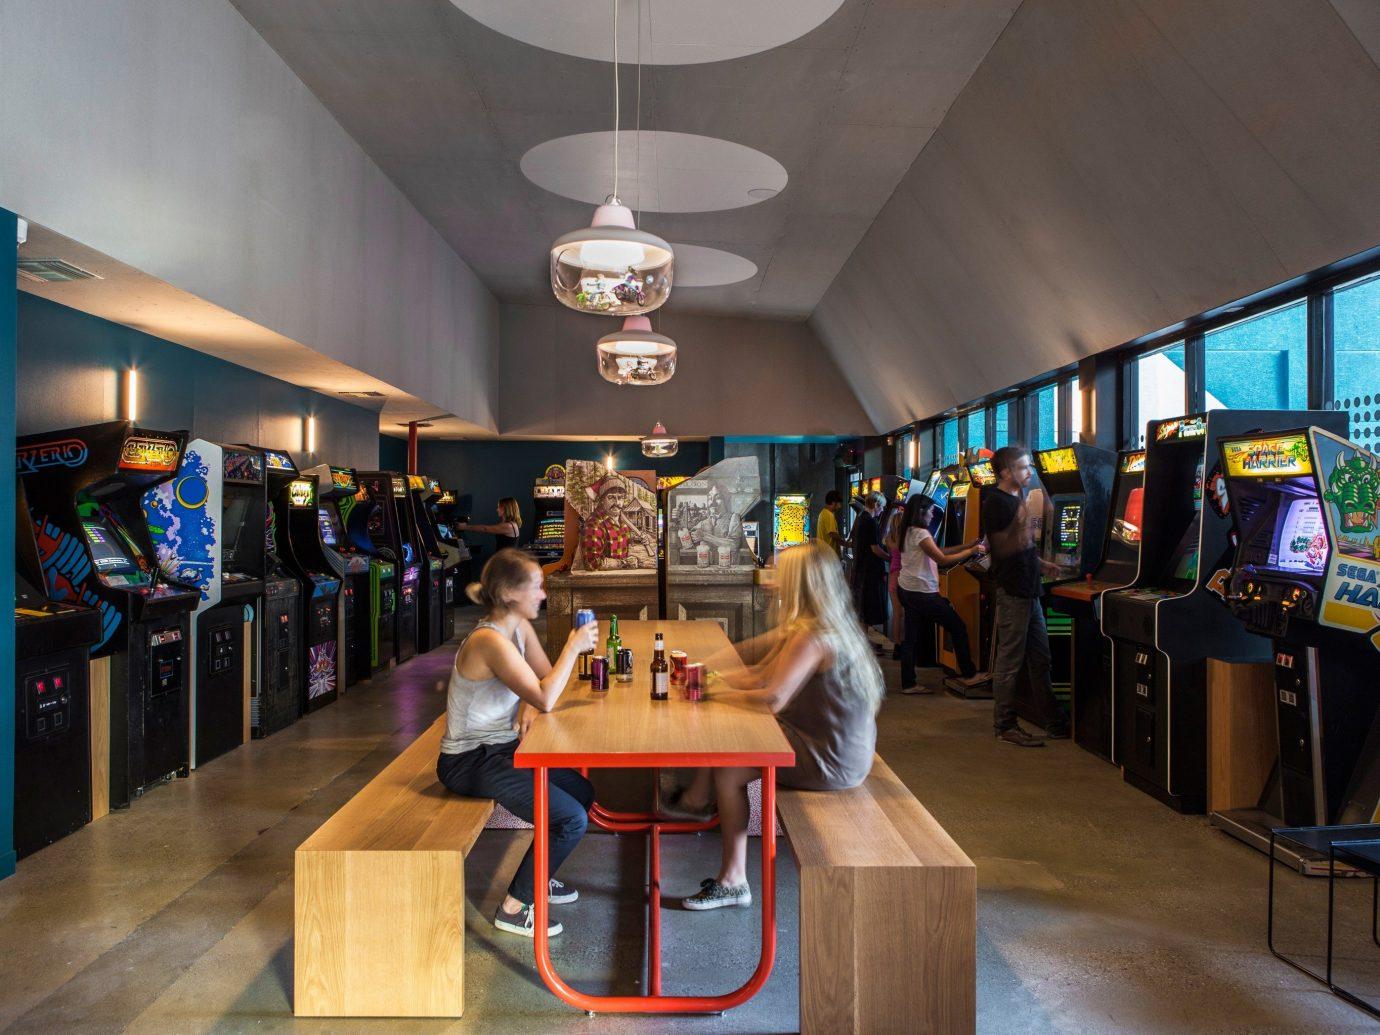 Summer Series indoor floor ceiling wall building interior design shopping mall Bar restaurant tourist attraction